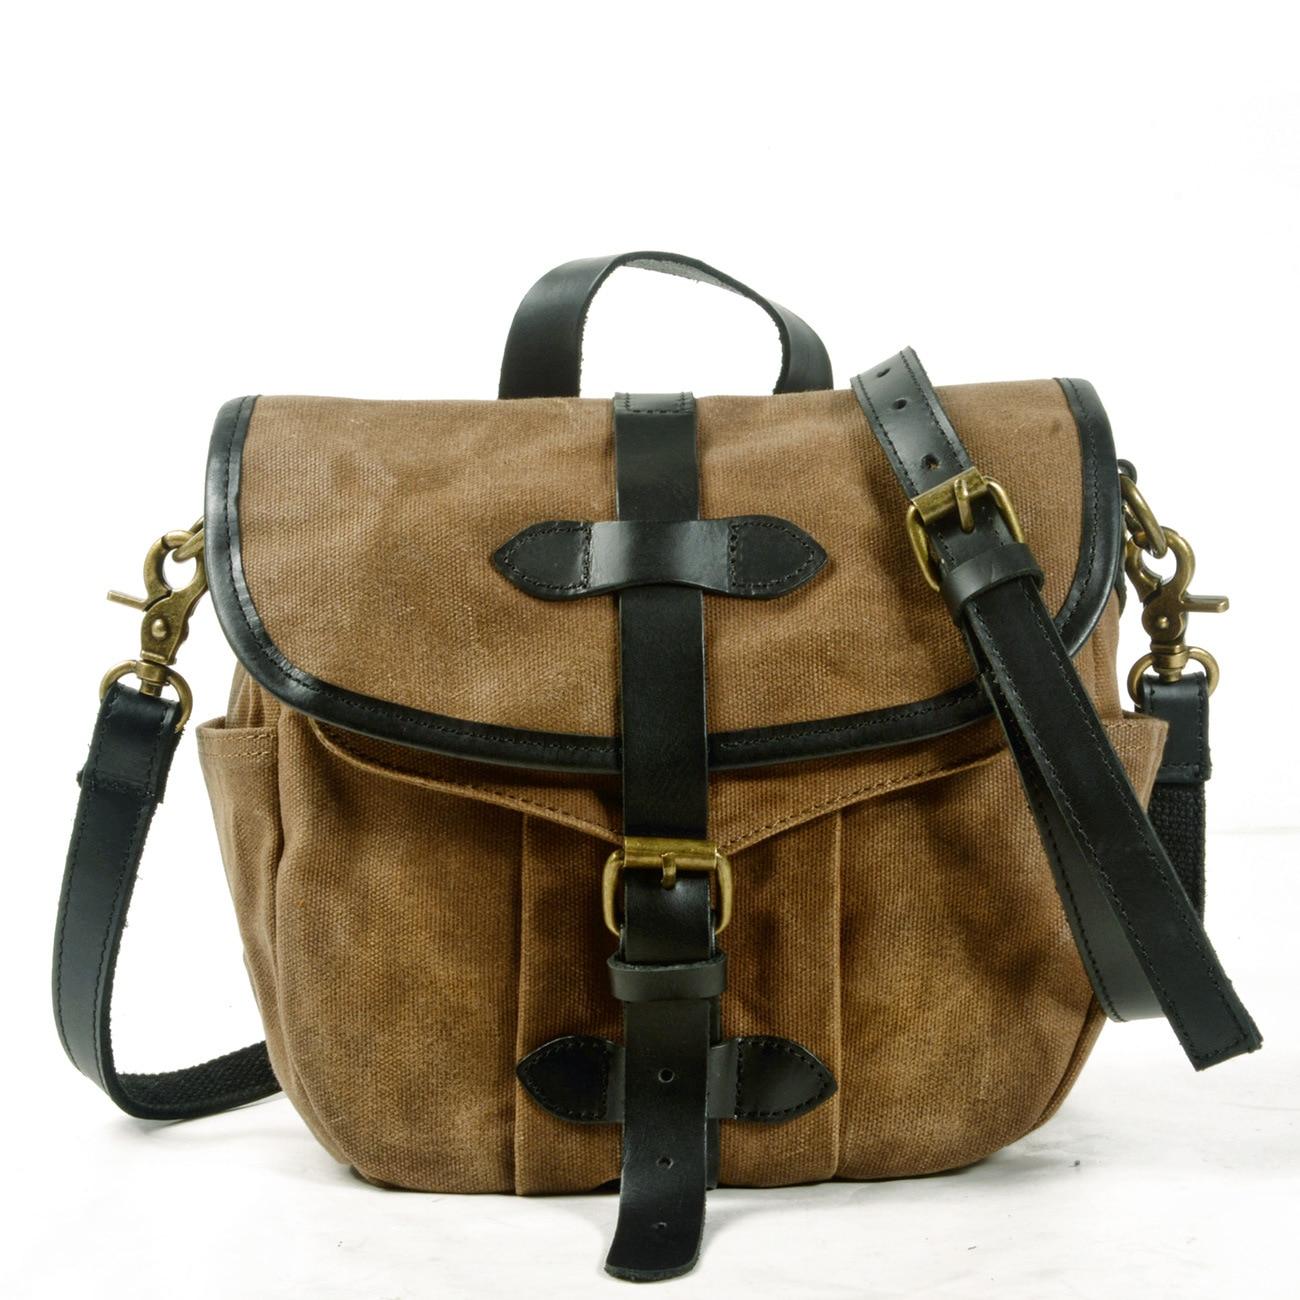 Ami Kakji bolso de mensajero Retro americano, bolso de lona Casual, bolso de hombro/bandolera, bolso de hombre, bolso de moto con sobrepeso